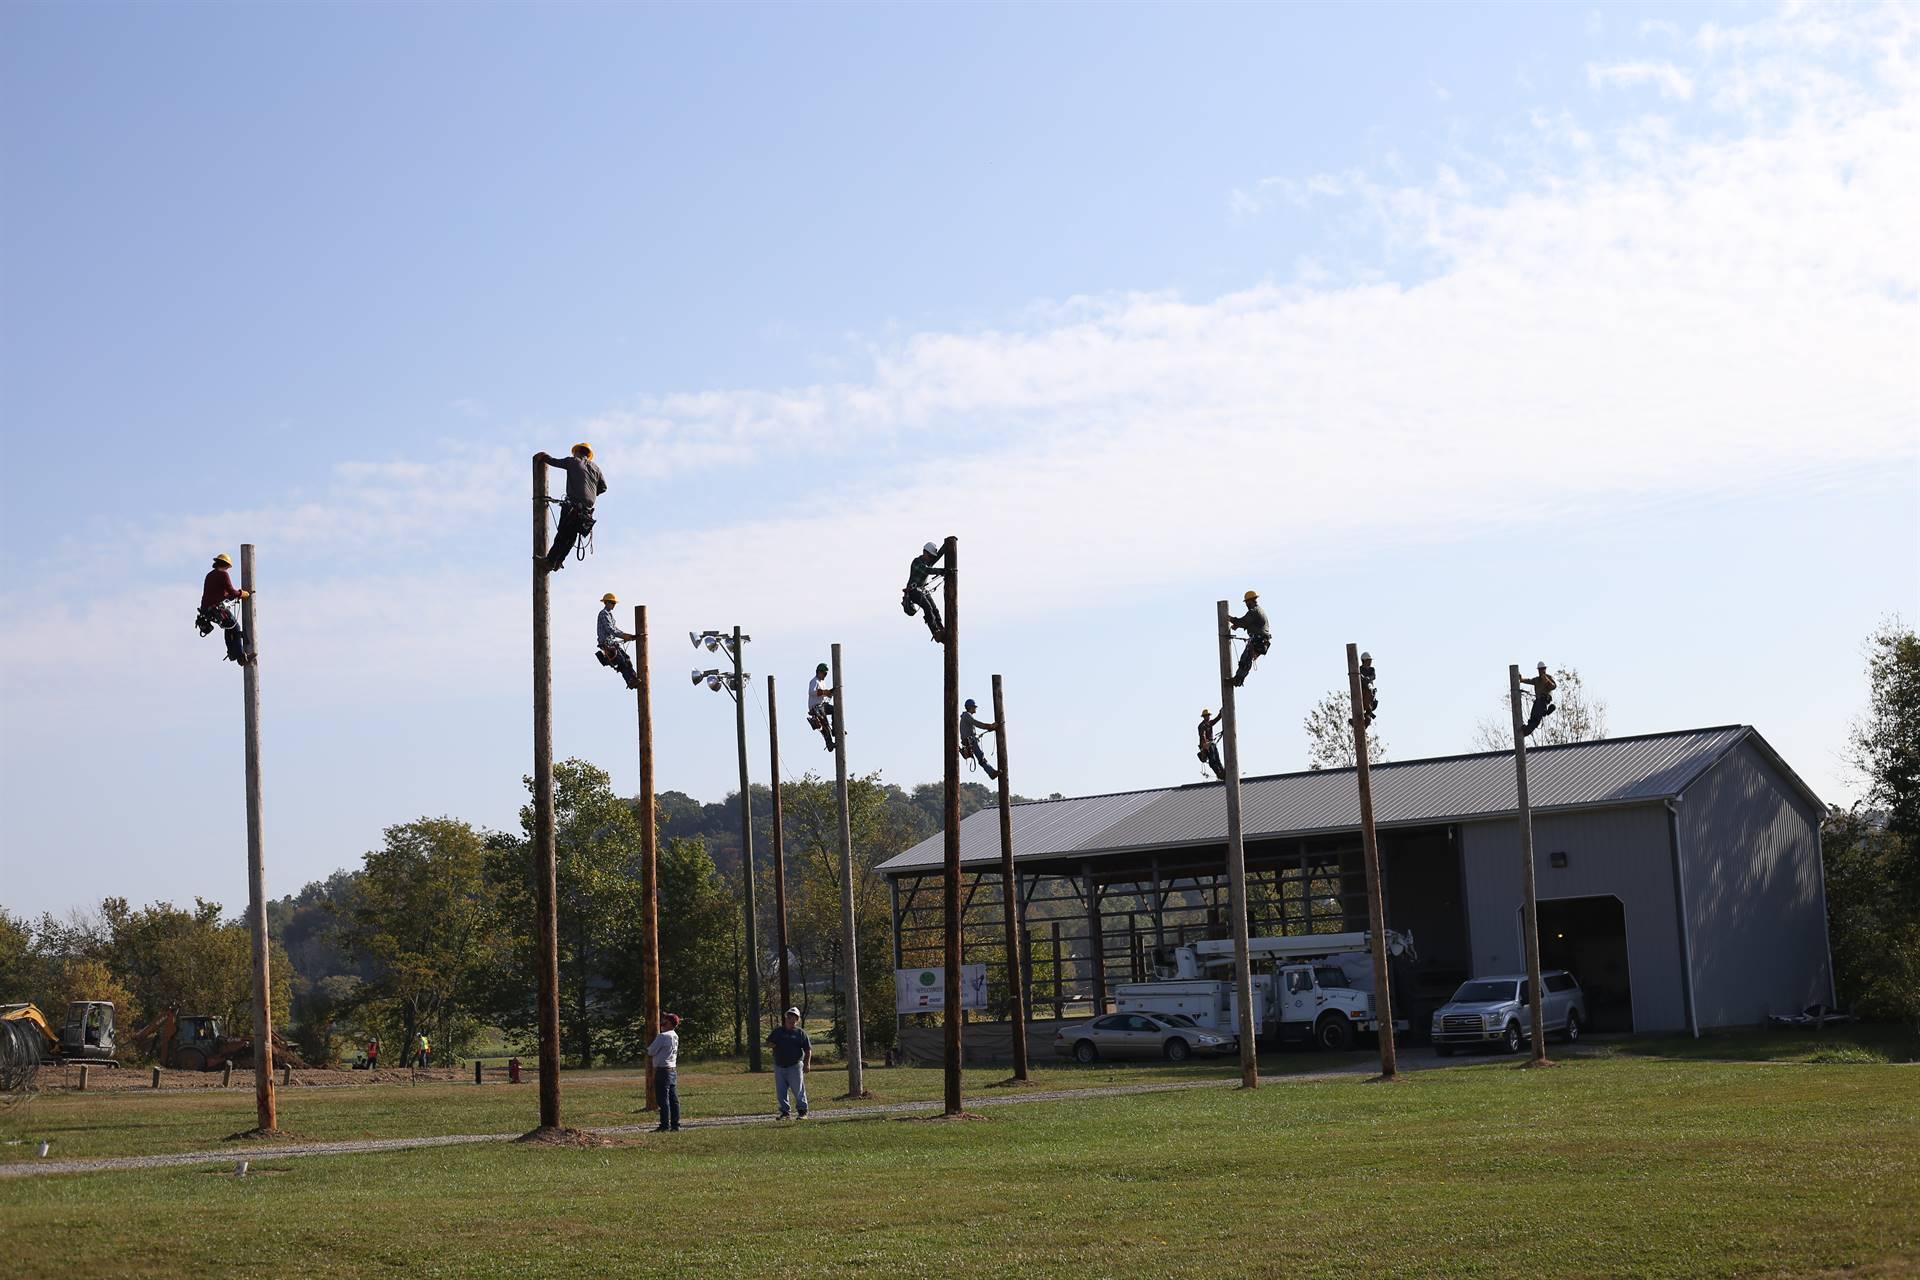 students on poles